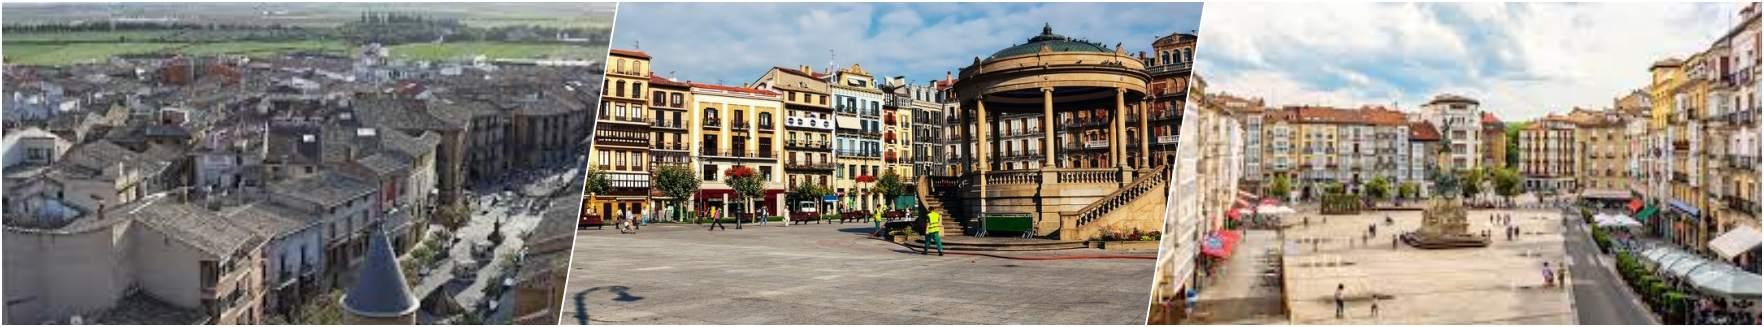 Navvare - Pamplona - Vitoria Gasteiz